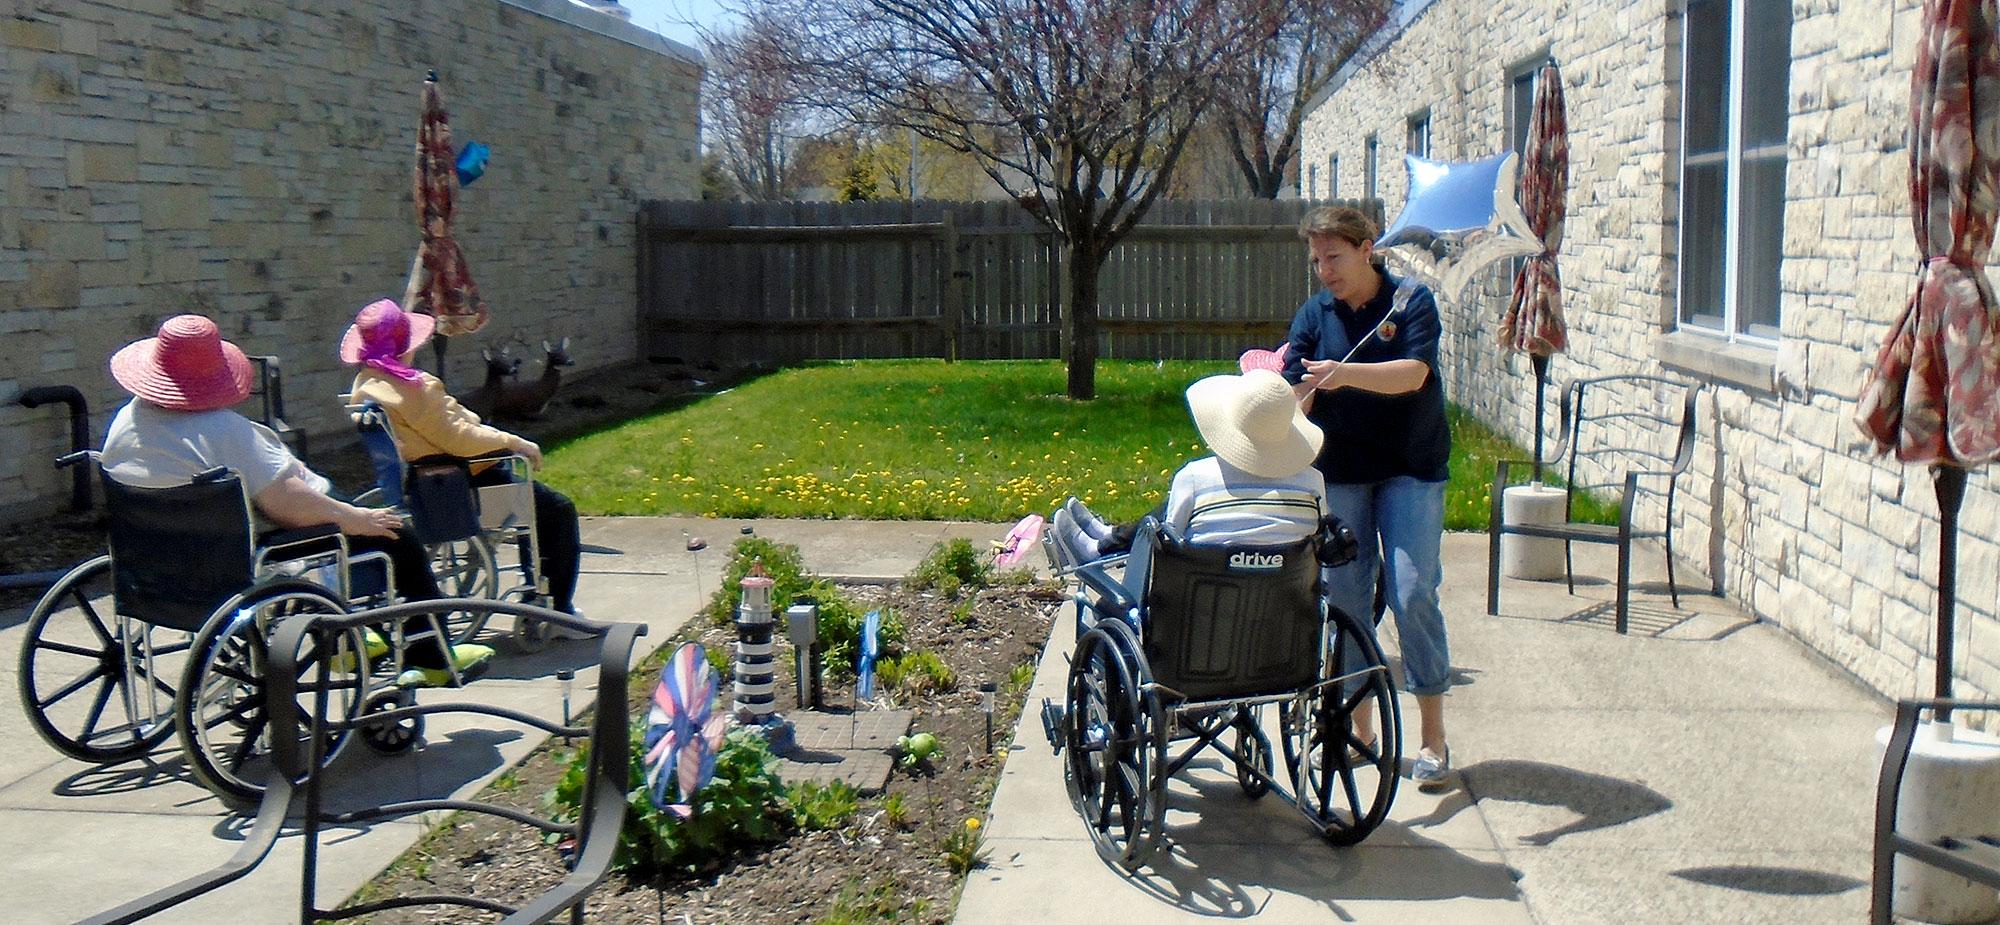 Algoma Wisconsin skilled nursing and rehabilitative care